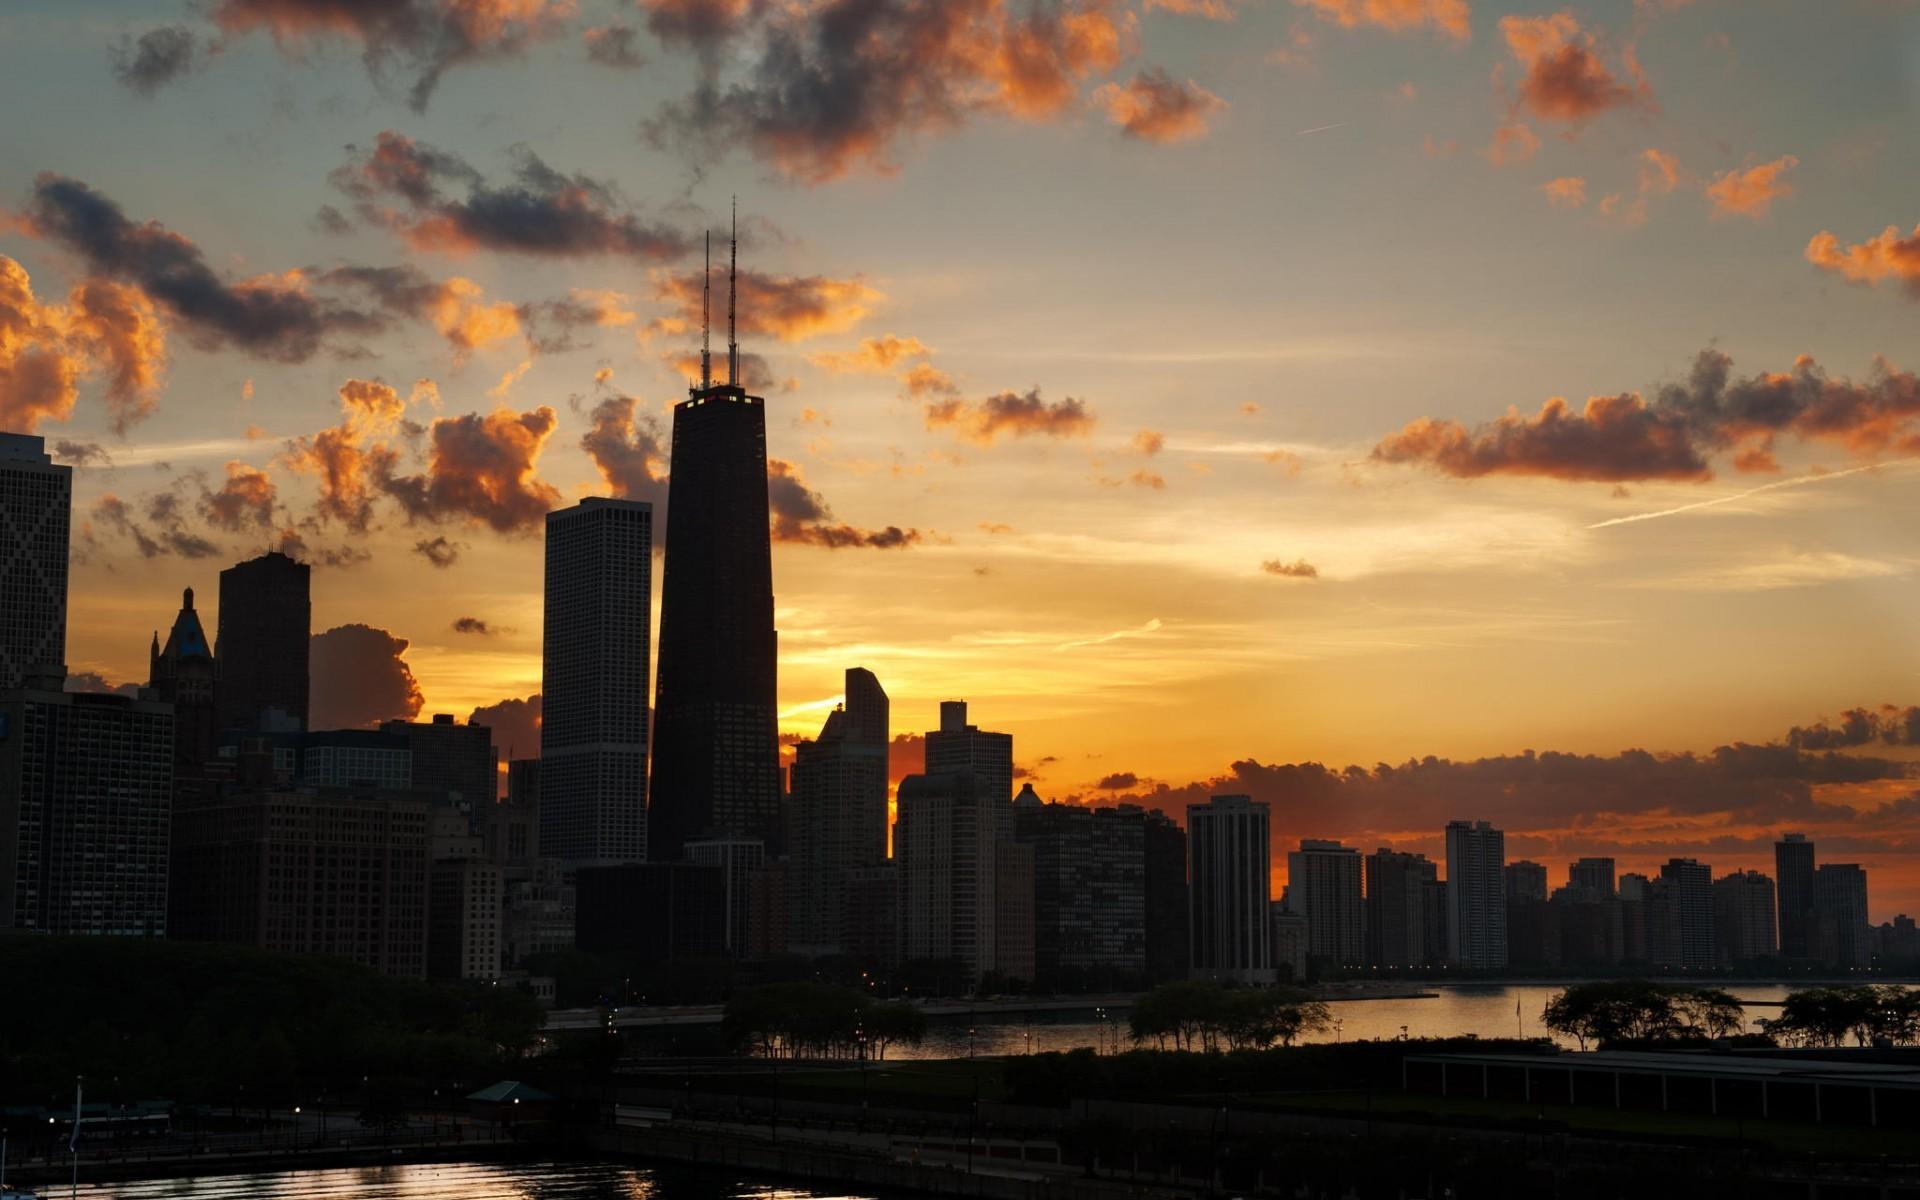 General 1920x1200 cityscape sunset skyline Chicago skyscraper USA sky